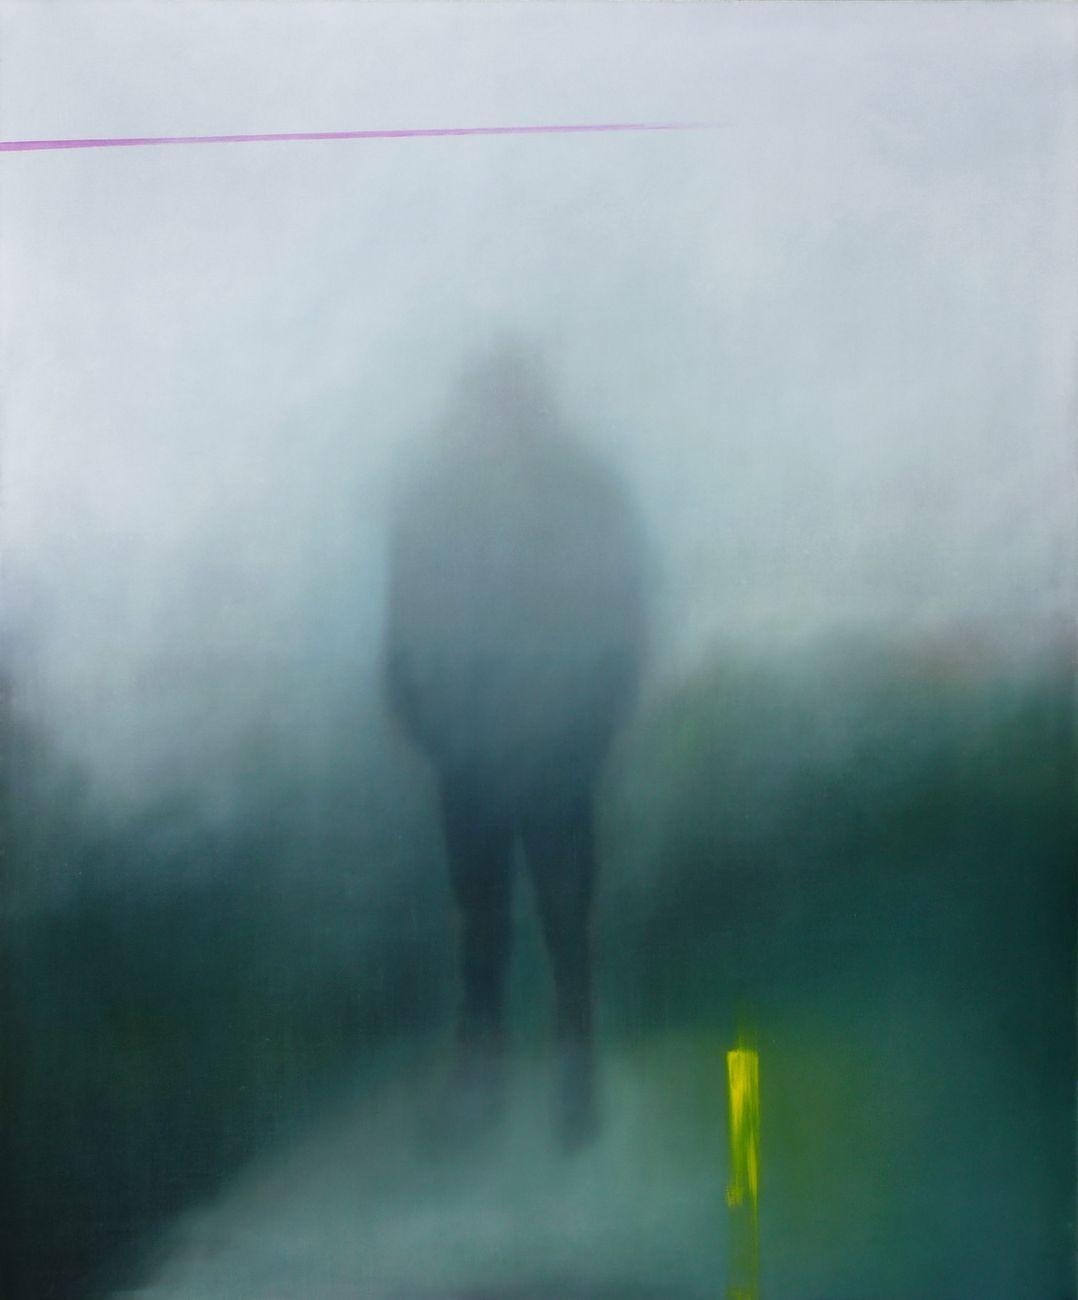 Samantha Torrisi, Untitled, 2021, olio su tela, 120x100 cm